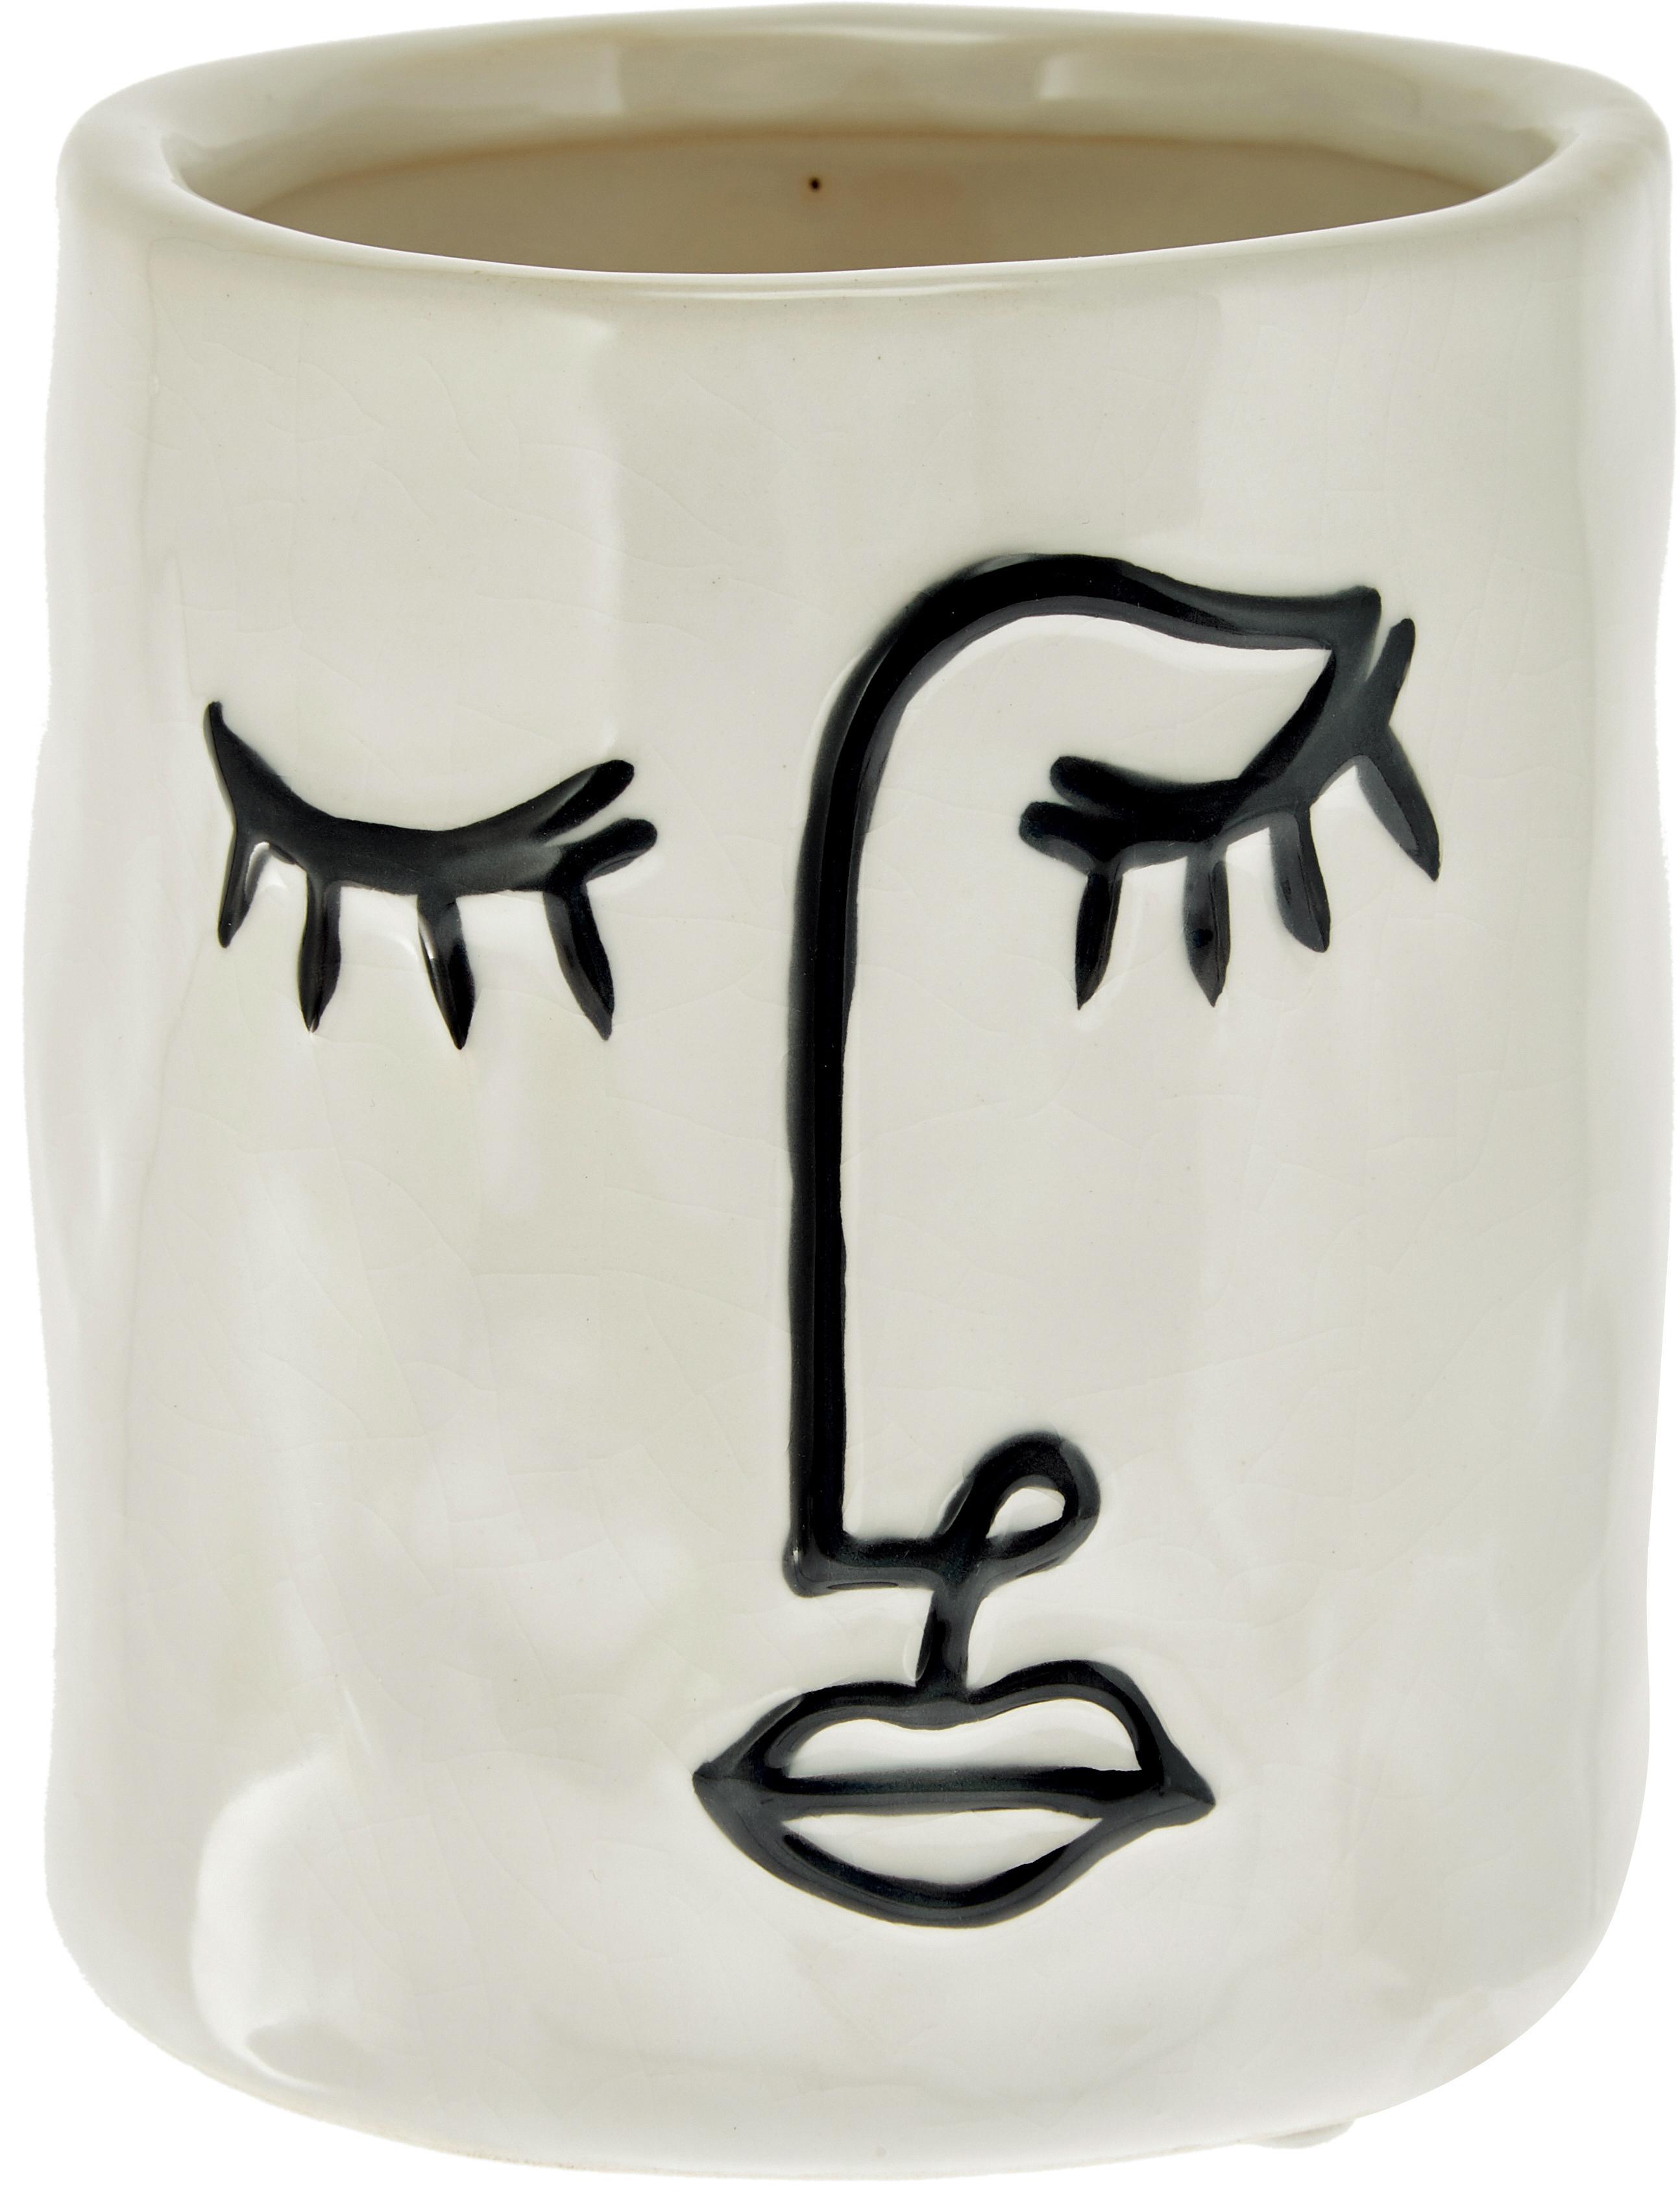 Kleine plantenpot Face van keramiek, Keramiek, Gebroken wit, zwart, Ø 12 x H 13 cm